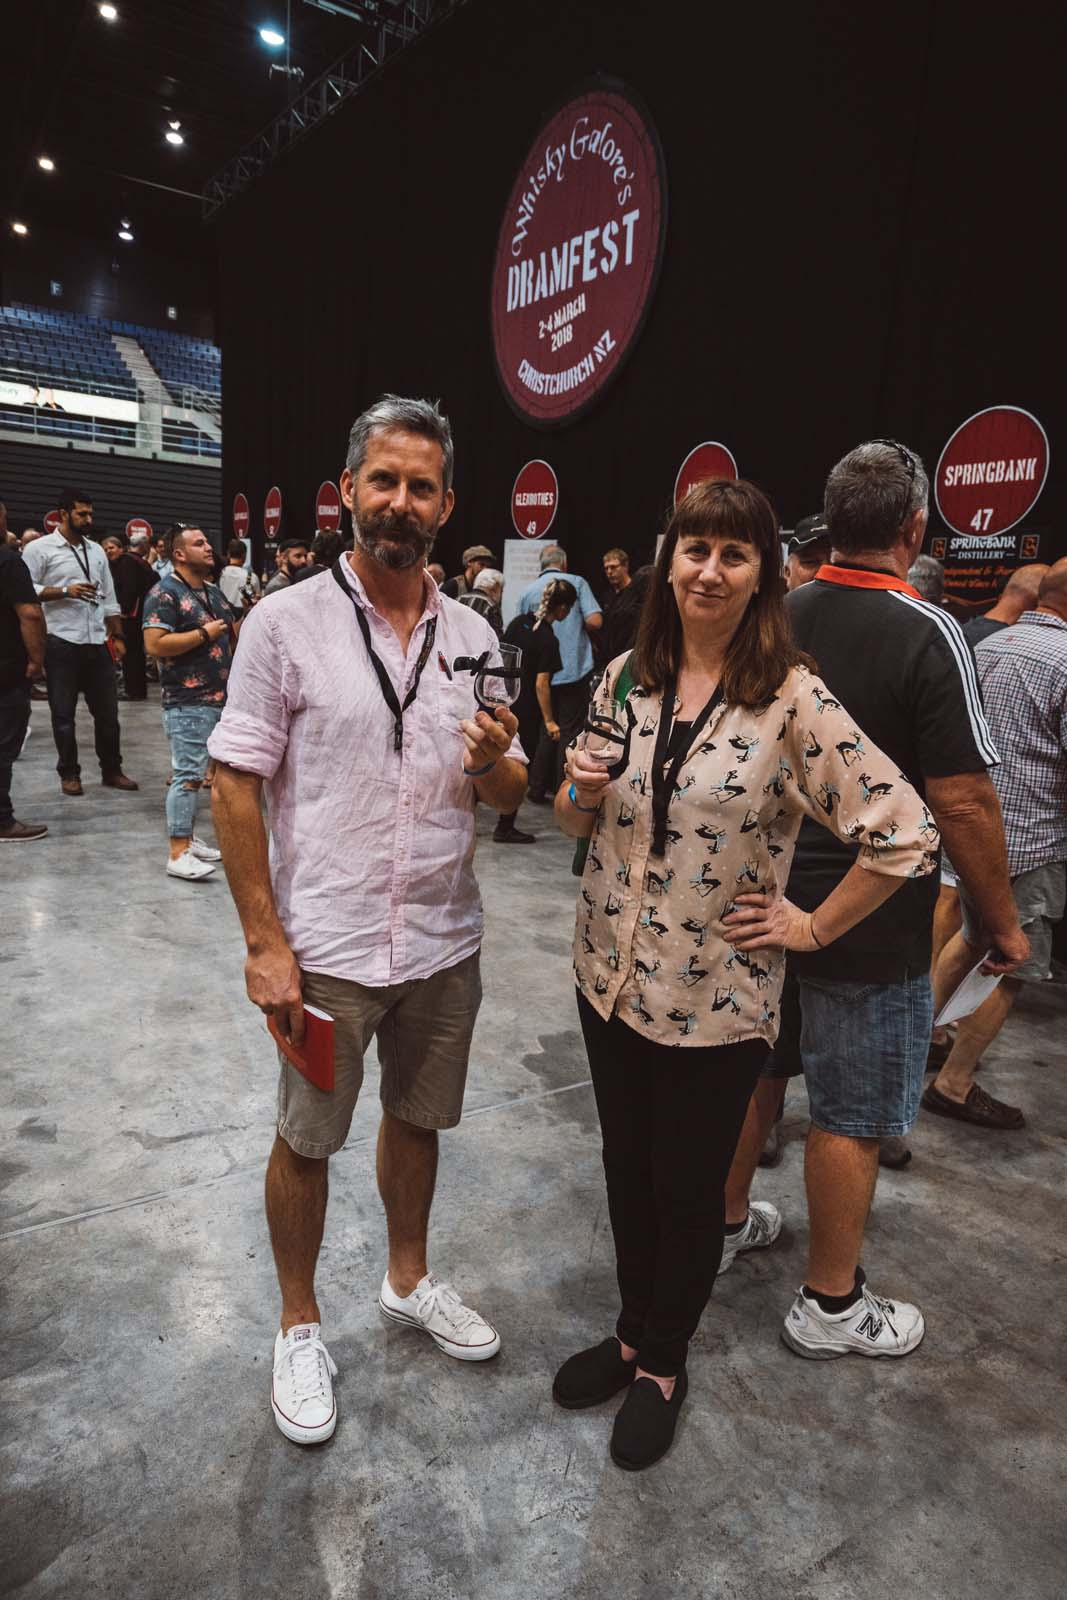 Dramfest 2018 for Whisky Galore-293.jpg